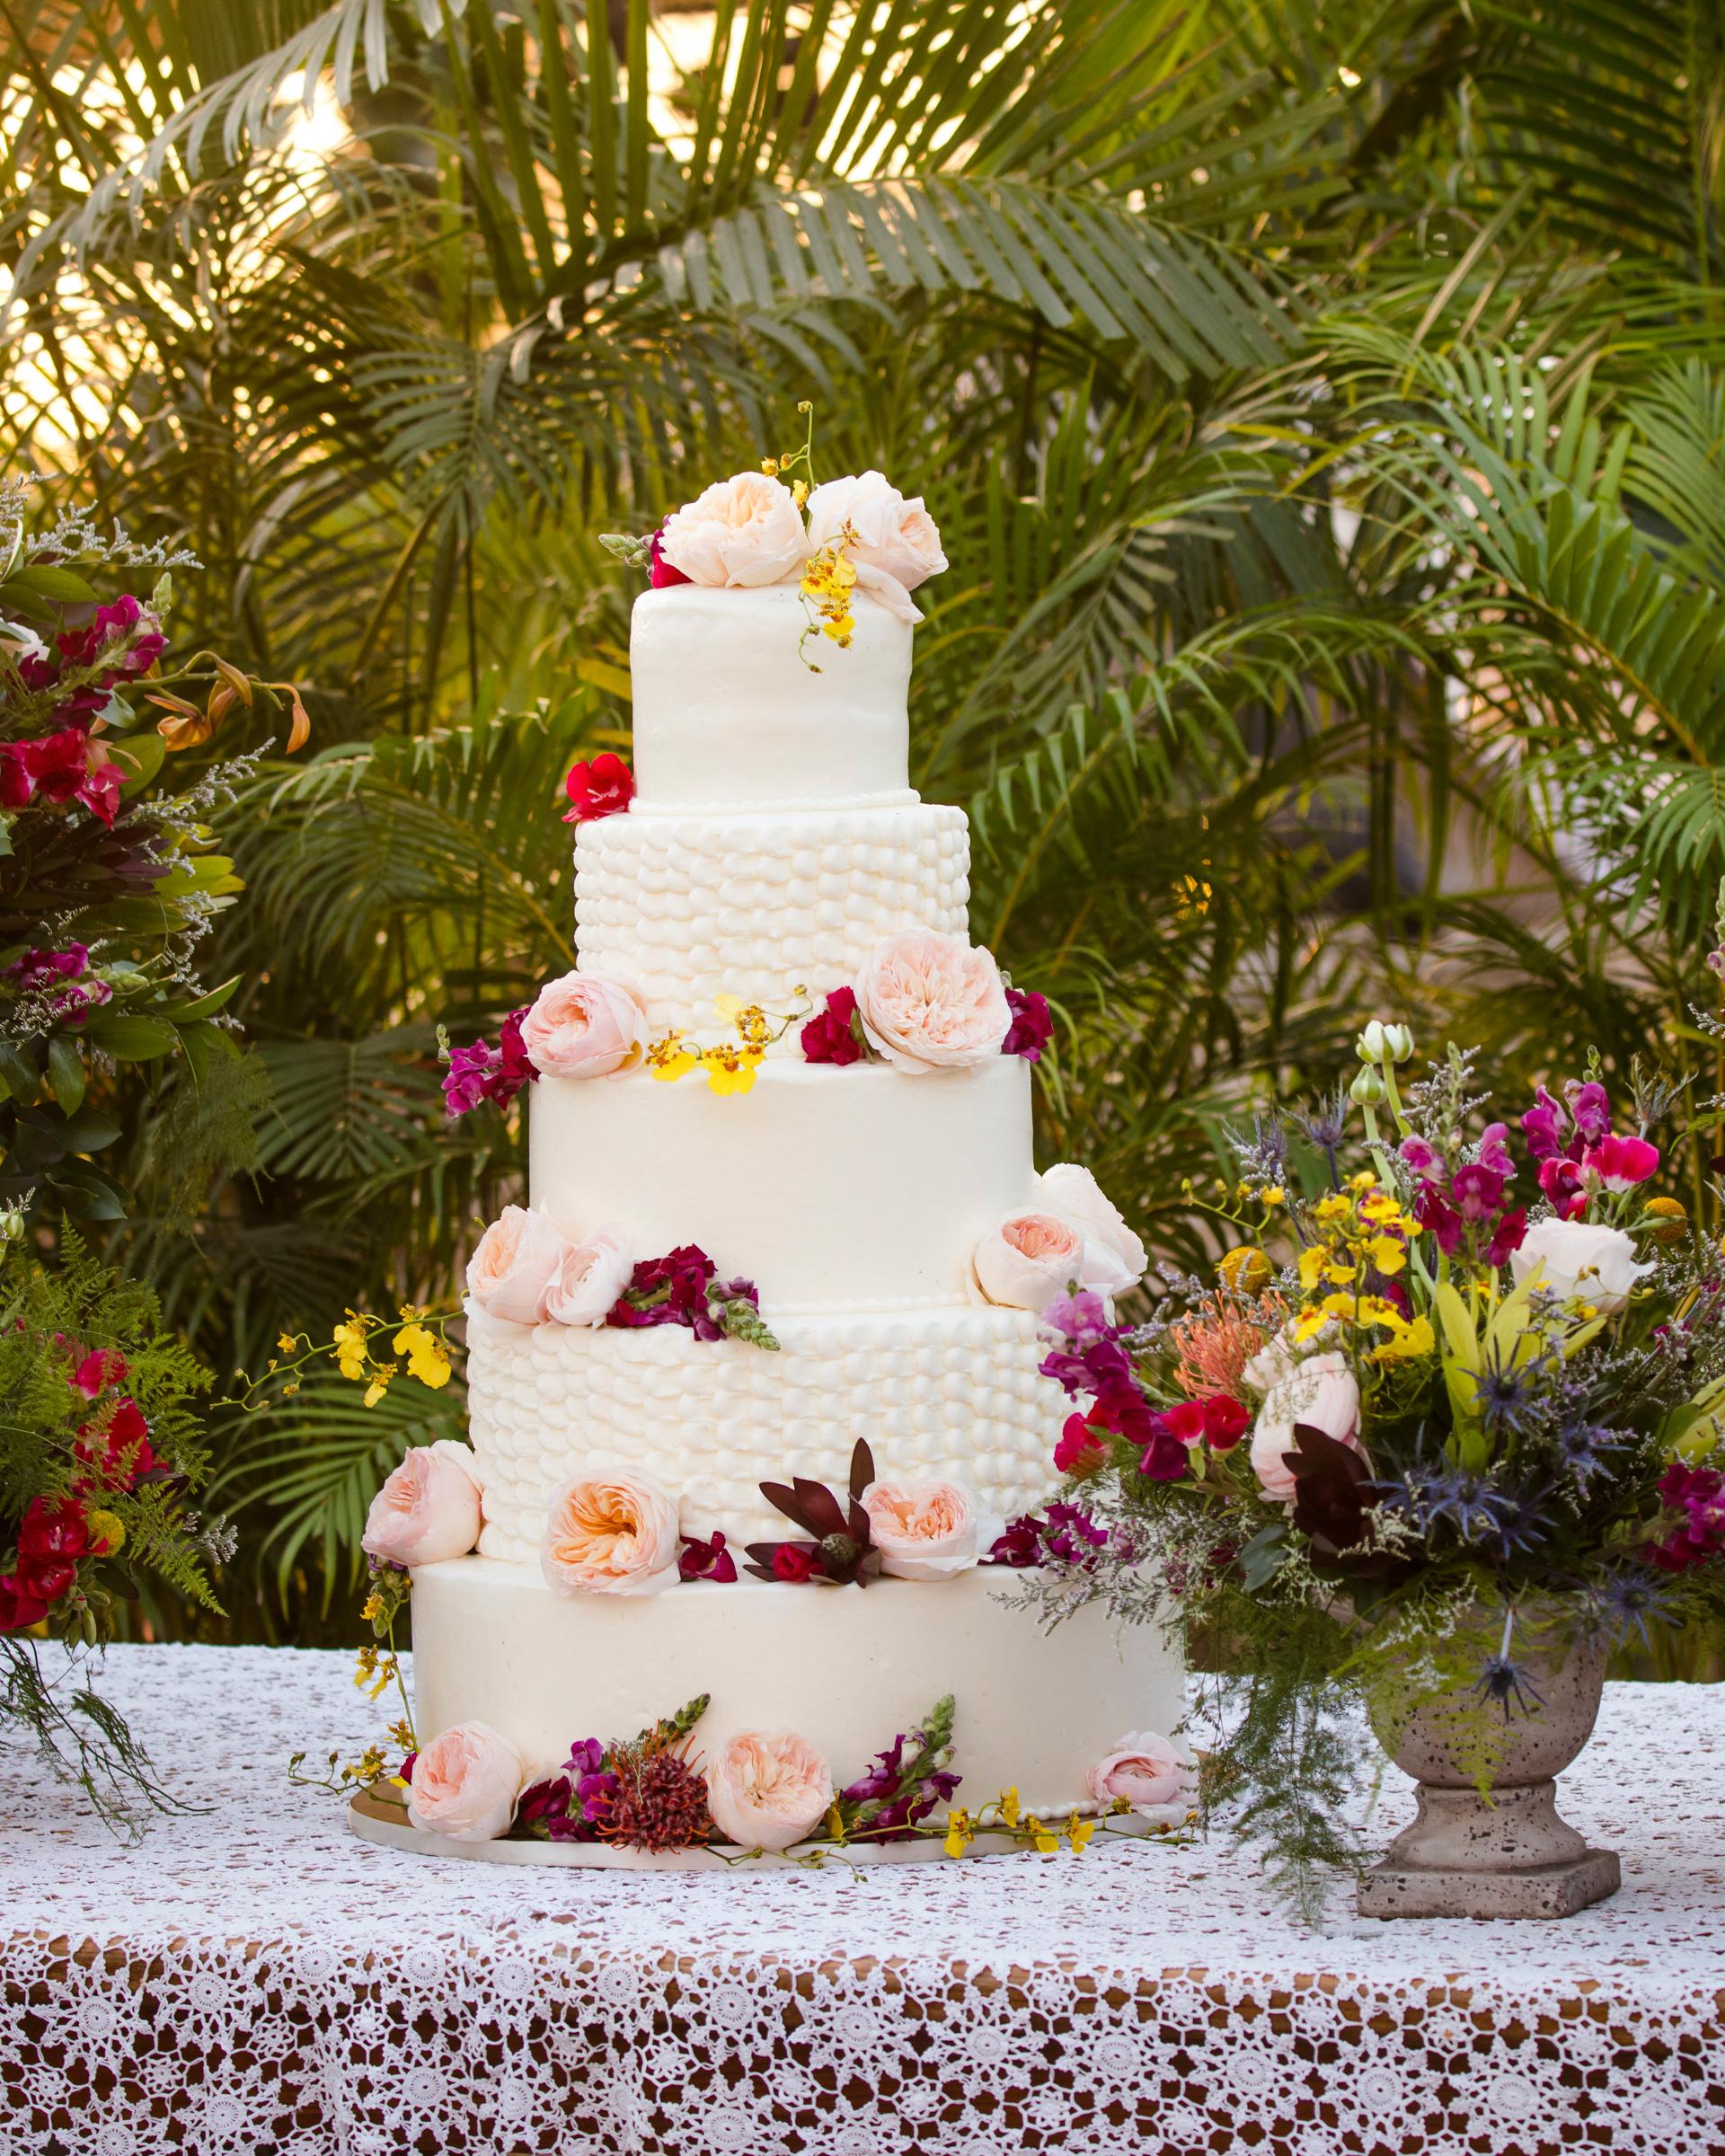 cristina andre wedding cake